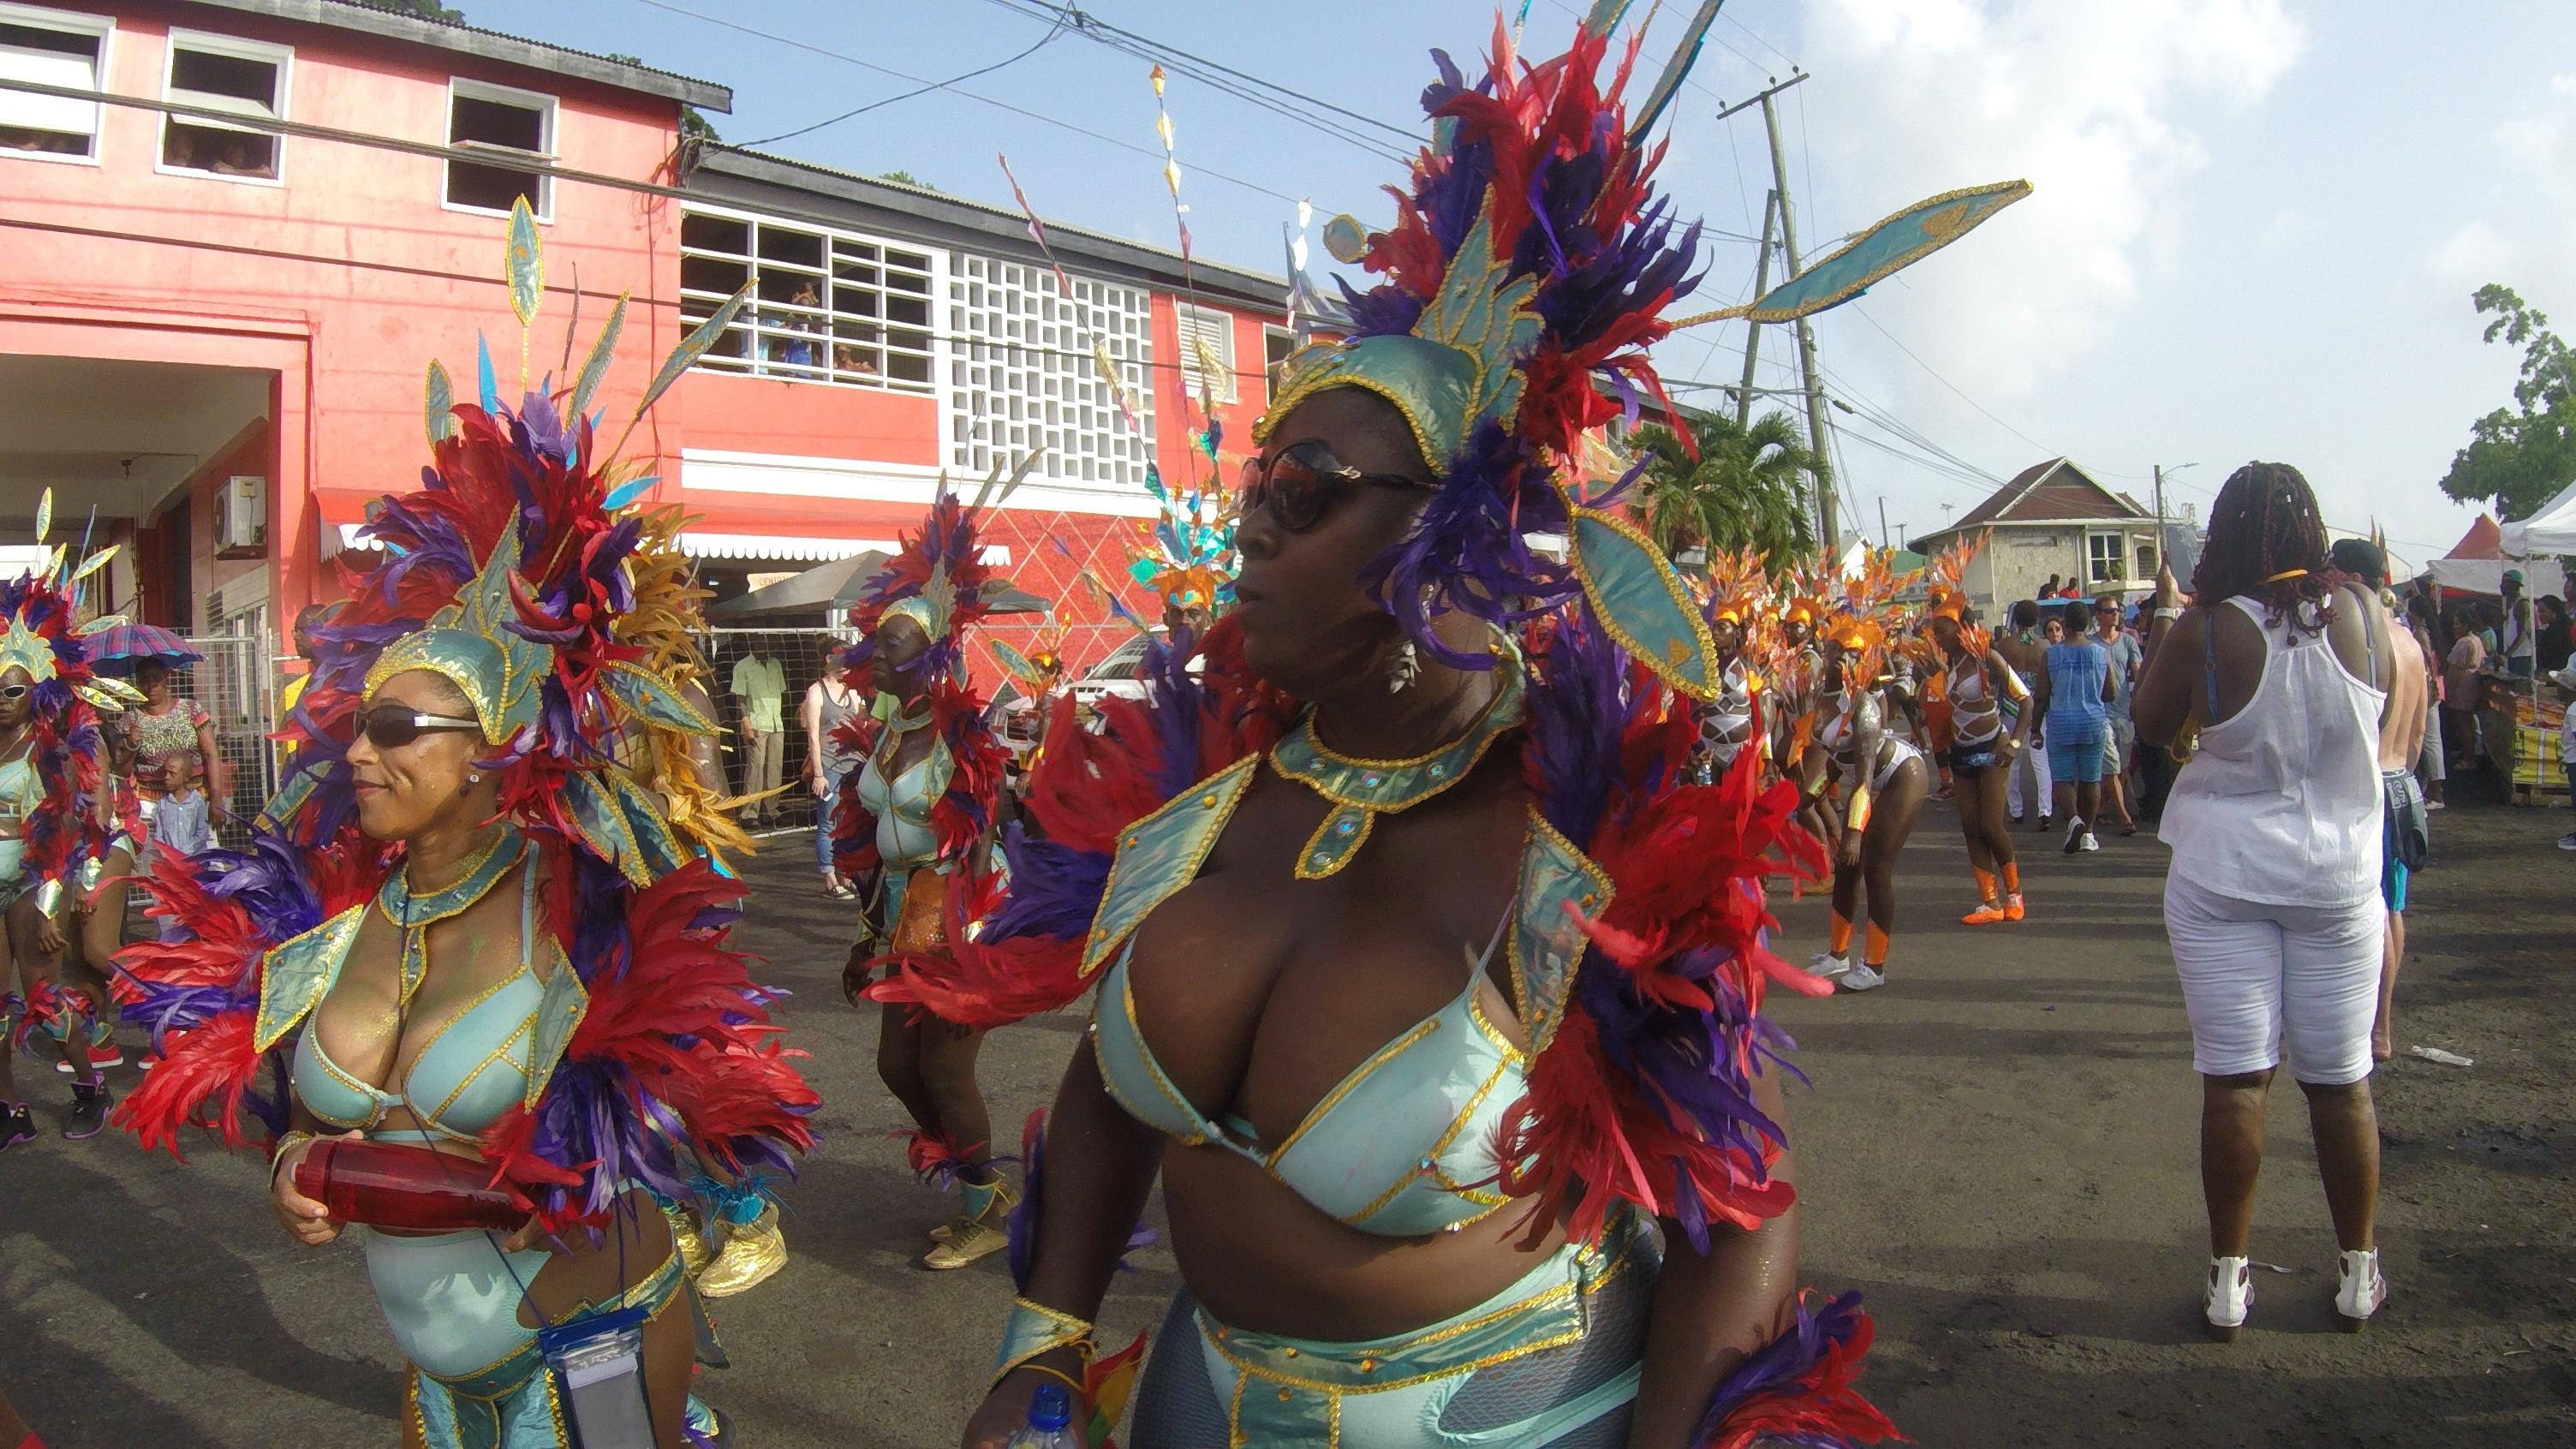 The Grenada Carnival David Cross International Travel Blog